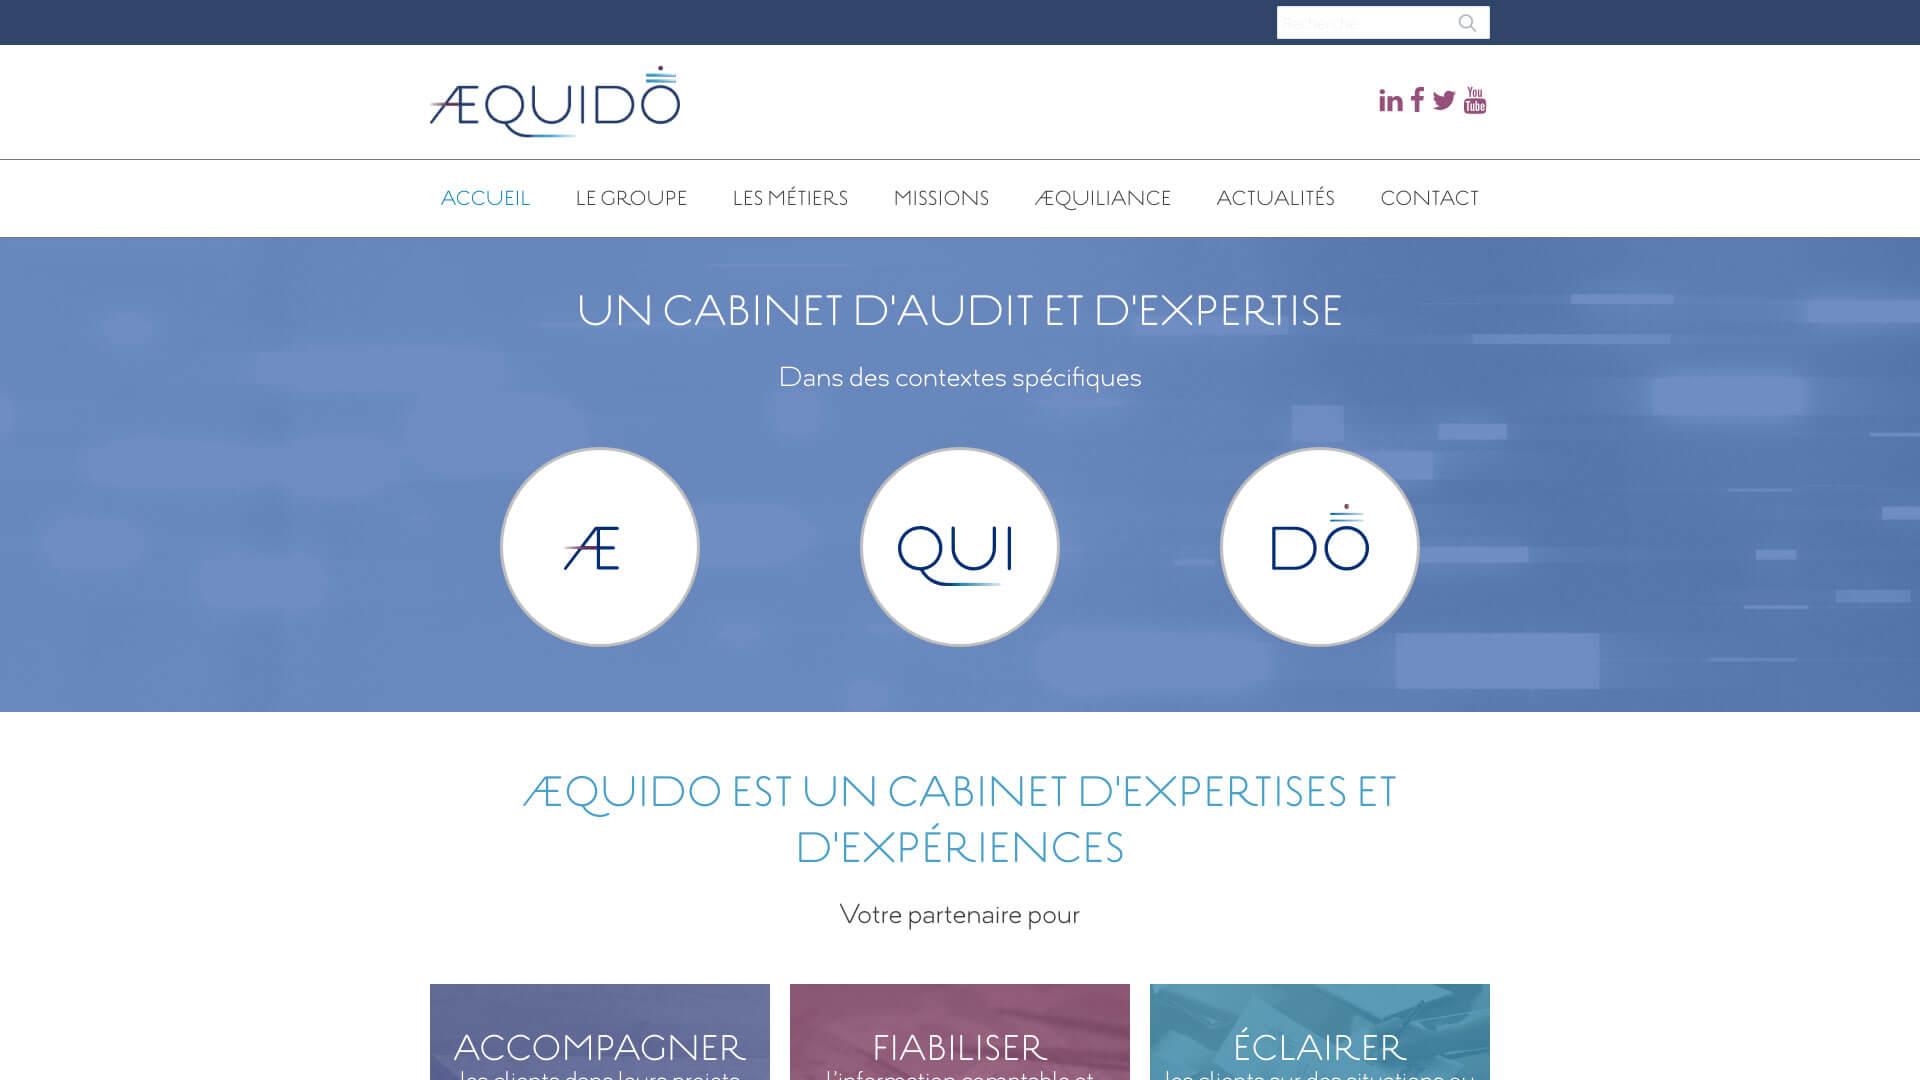 Aequido - Cabinet d'audit et d'expertise